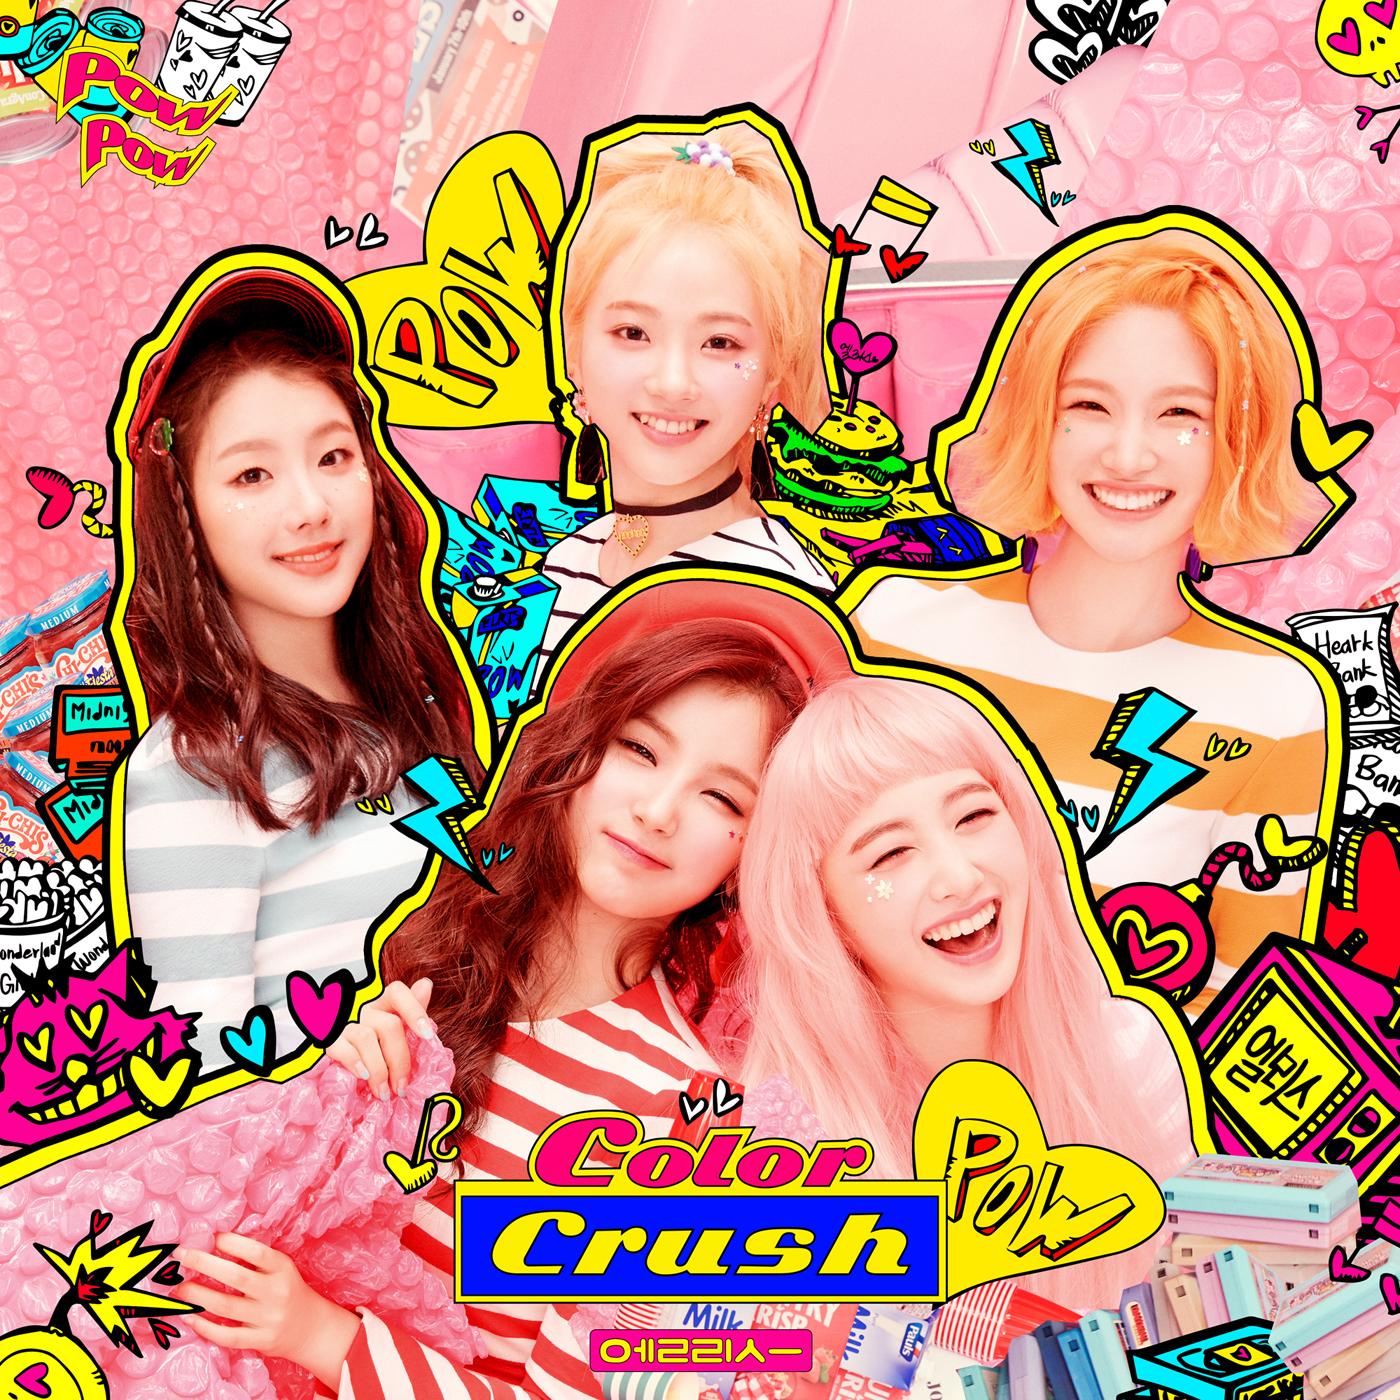 20170914.0417.3 Elris - Color Crush cover.jpg